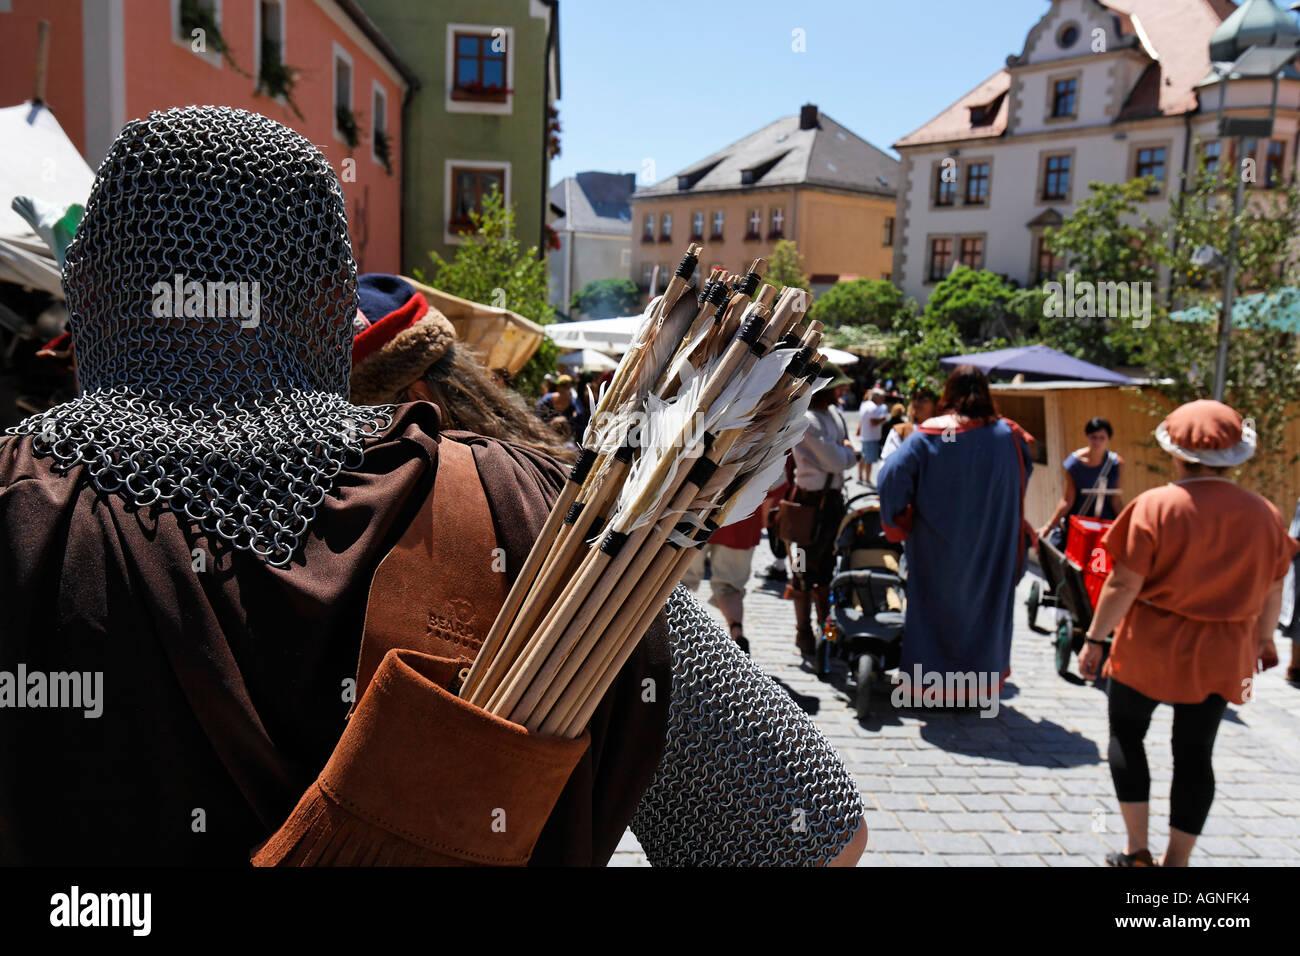 Nabburg , Middle Ages market arrows , Bavaria Germany - Stock Image